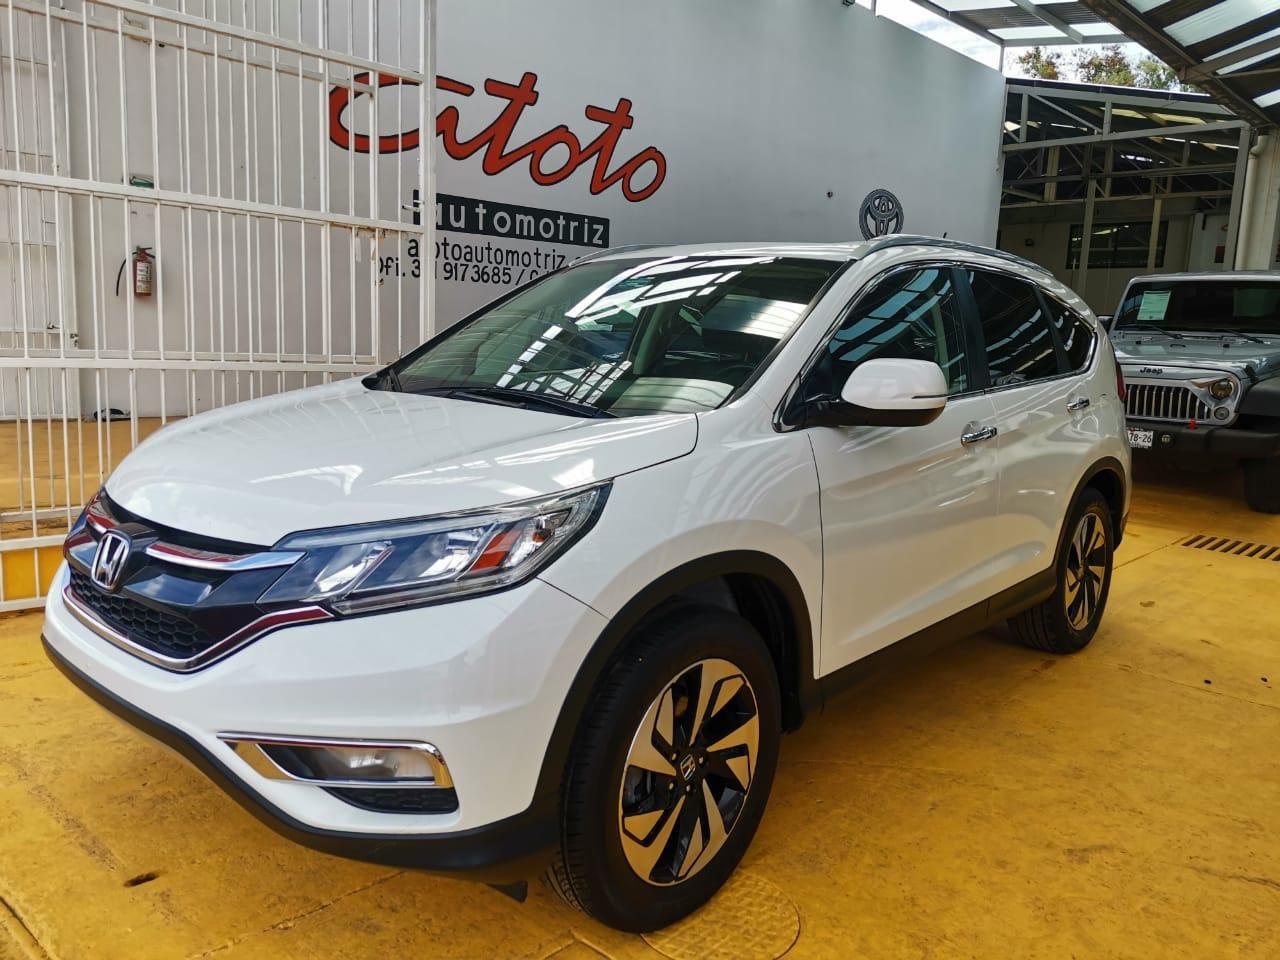 Honda Cr-V, 2016 EXL Navi